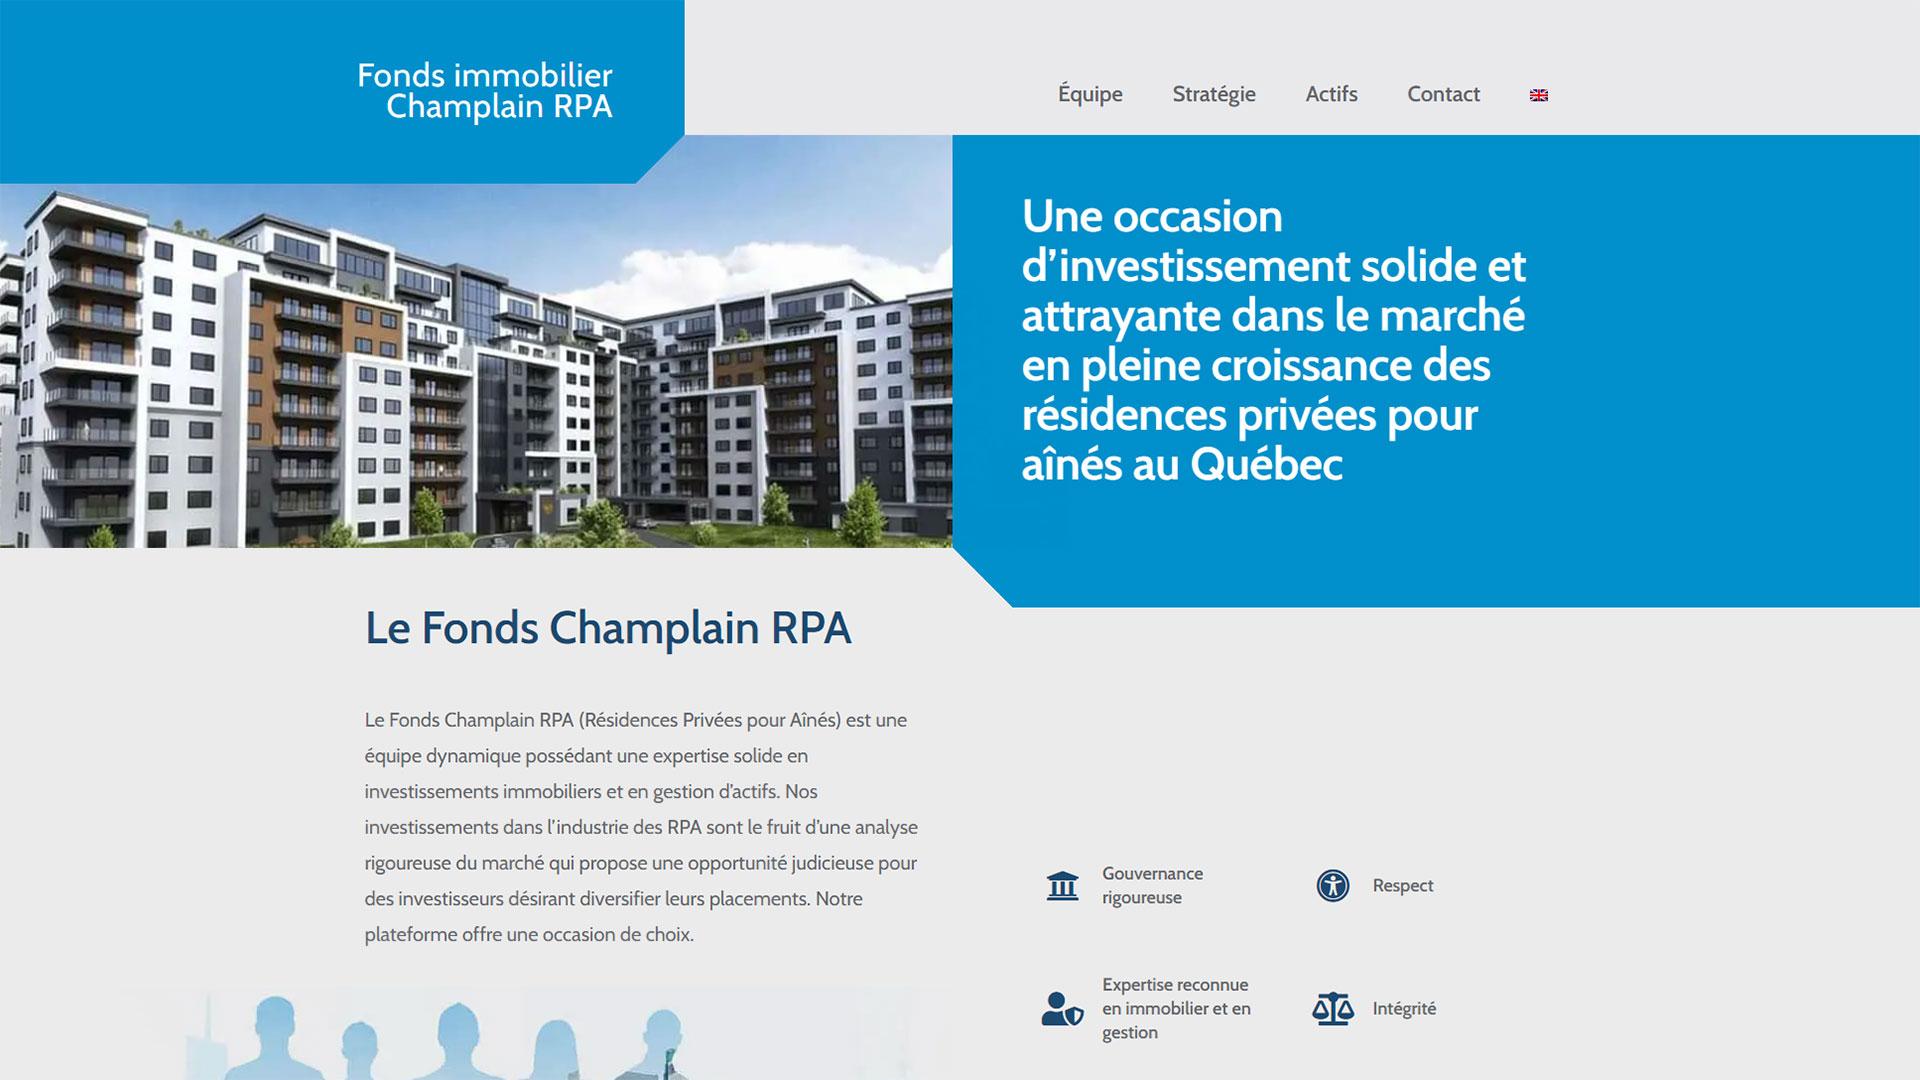 Fonds Champlain RPA